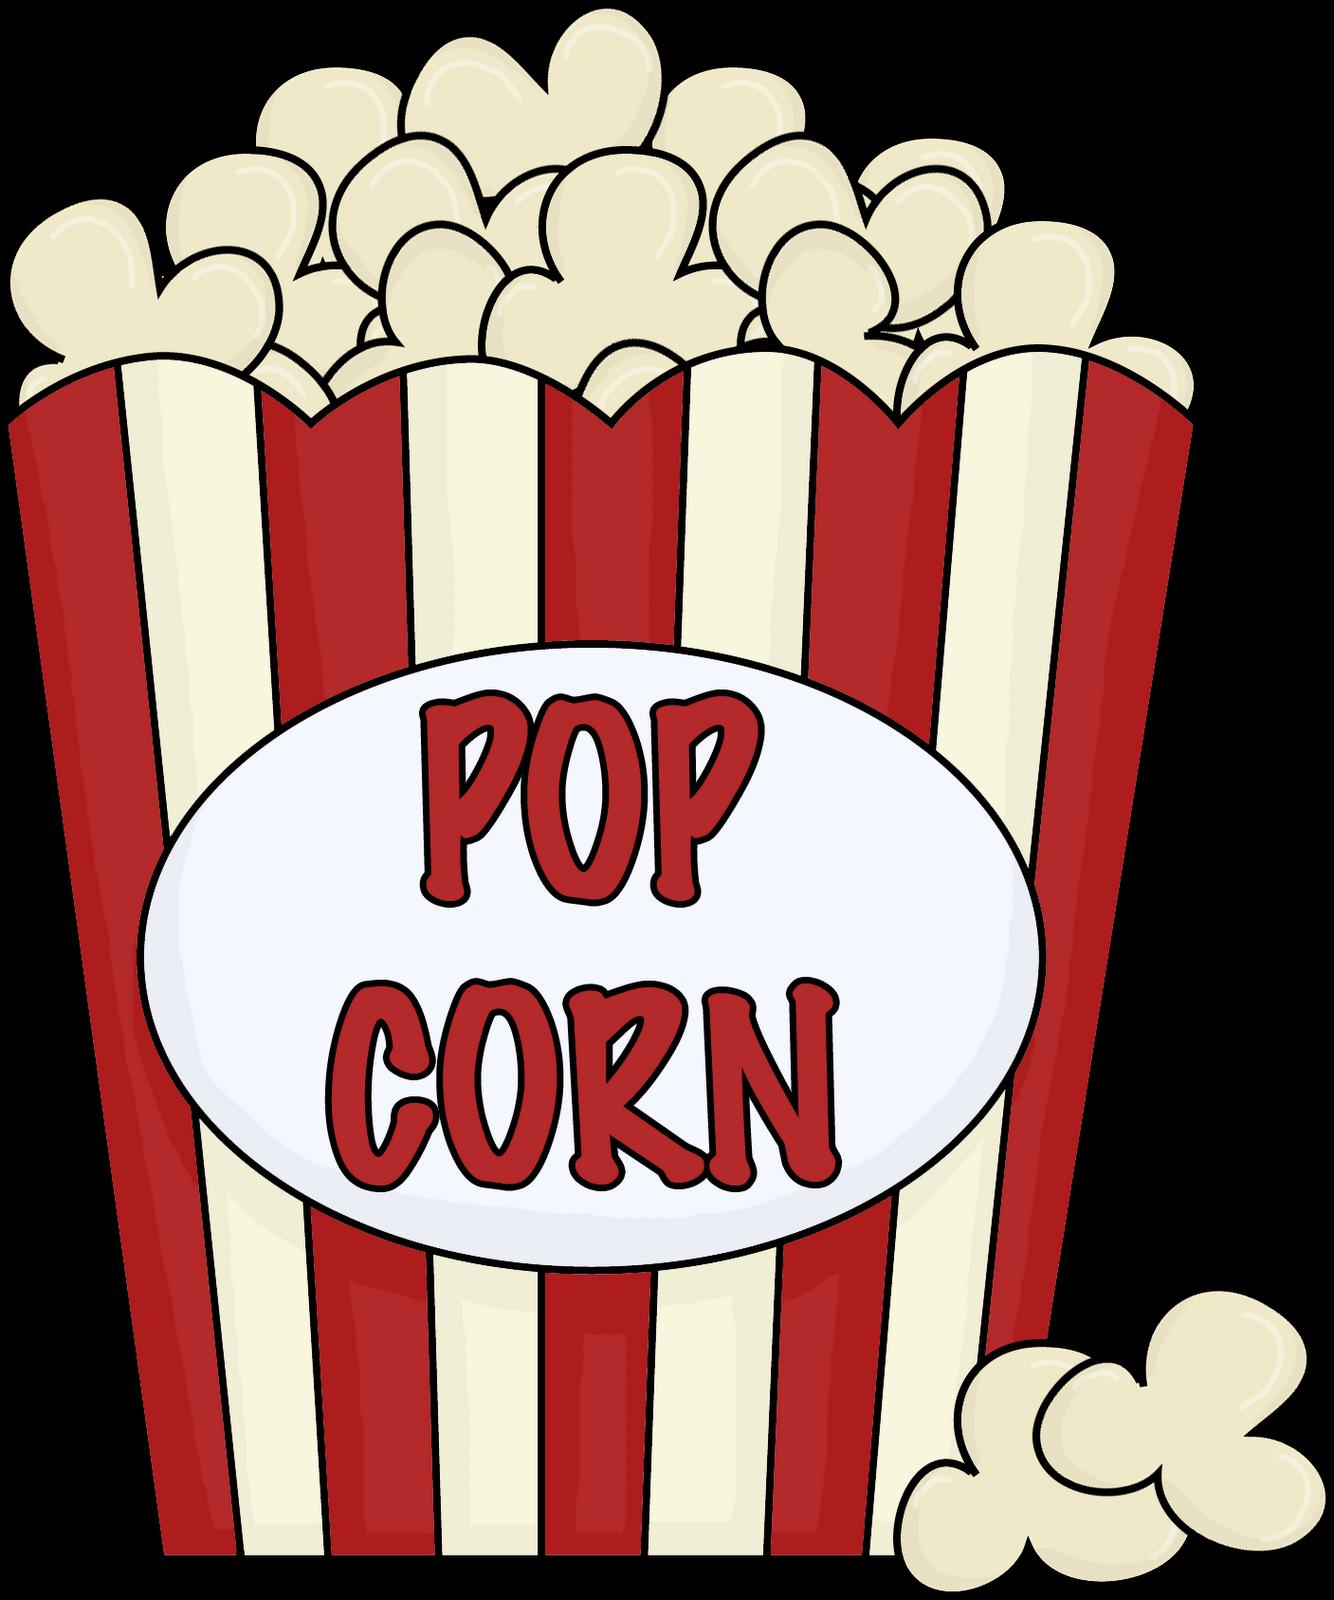 Pocorn clipart clip art Popcorn Clip Art Black And White Free Clipart Images clip art